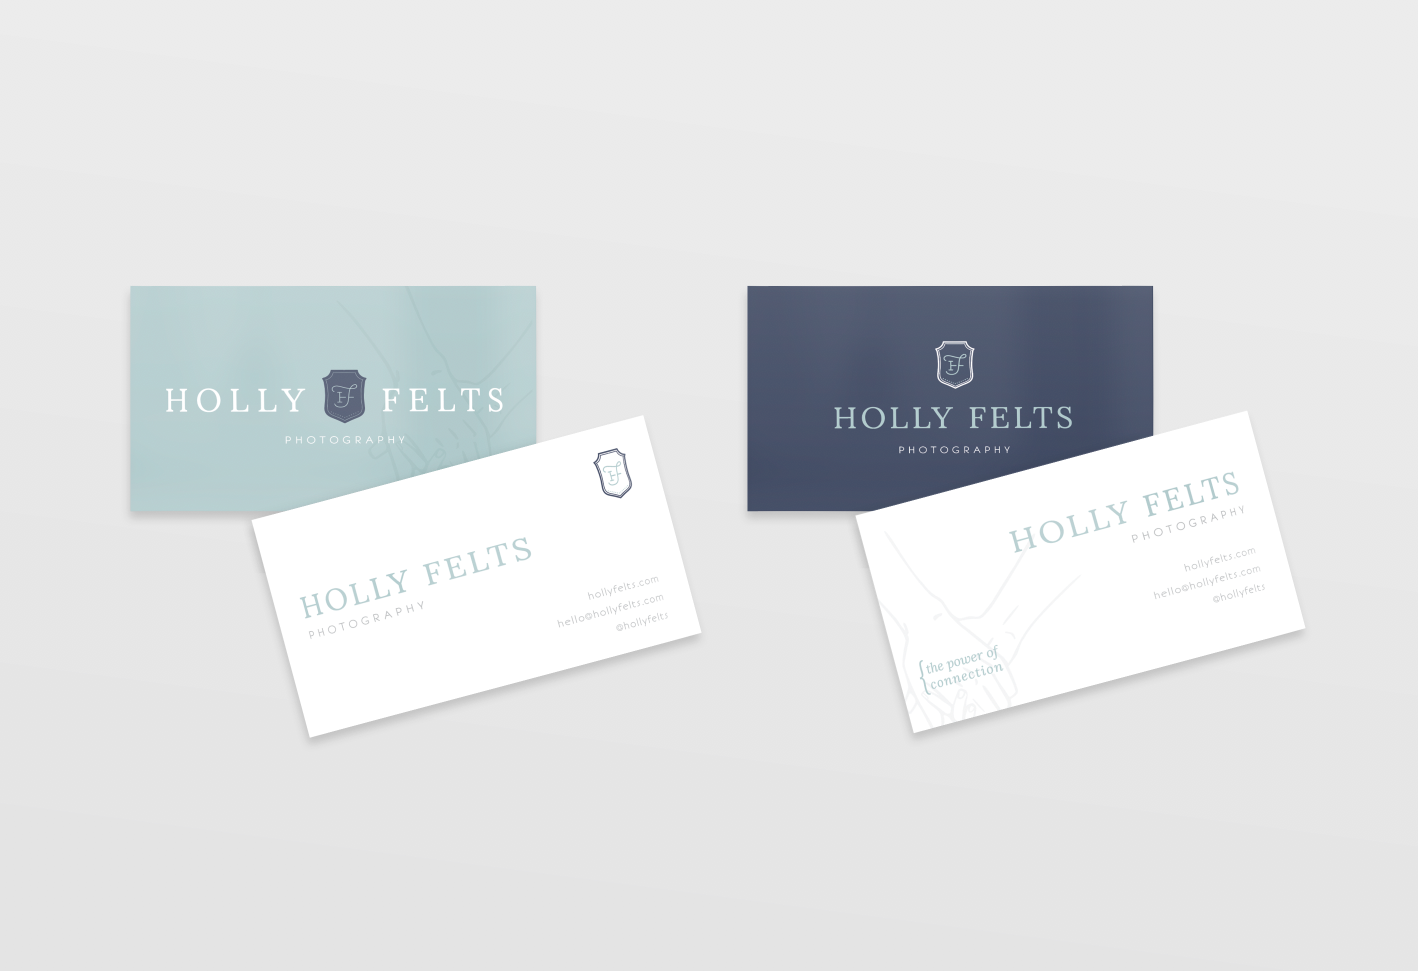 HayleyBighamDesigns-HollyFeltsPhotography-Rebrand-logodesign-branding-businesscards.jpg